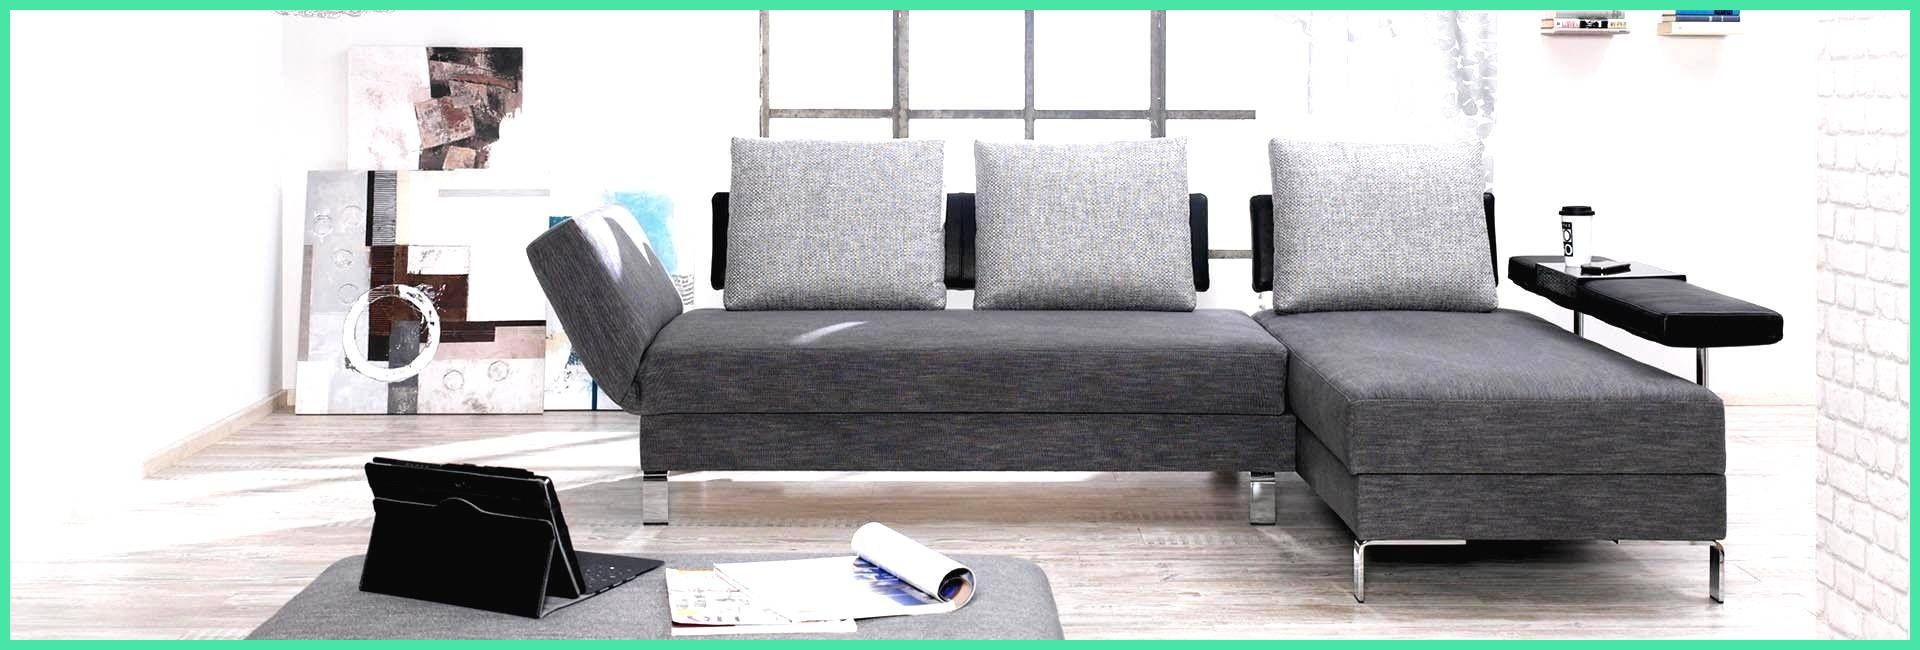 112 Reference Of Crushed Velvet Sofa Furniture Village In 2020 Sofa Luxury Sofa Crushed Velvet Sofa